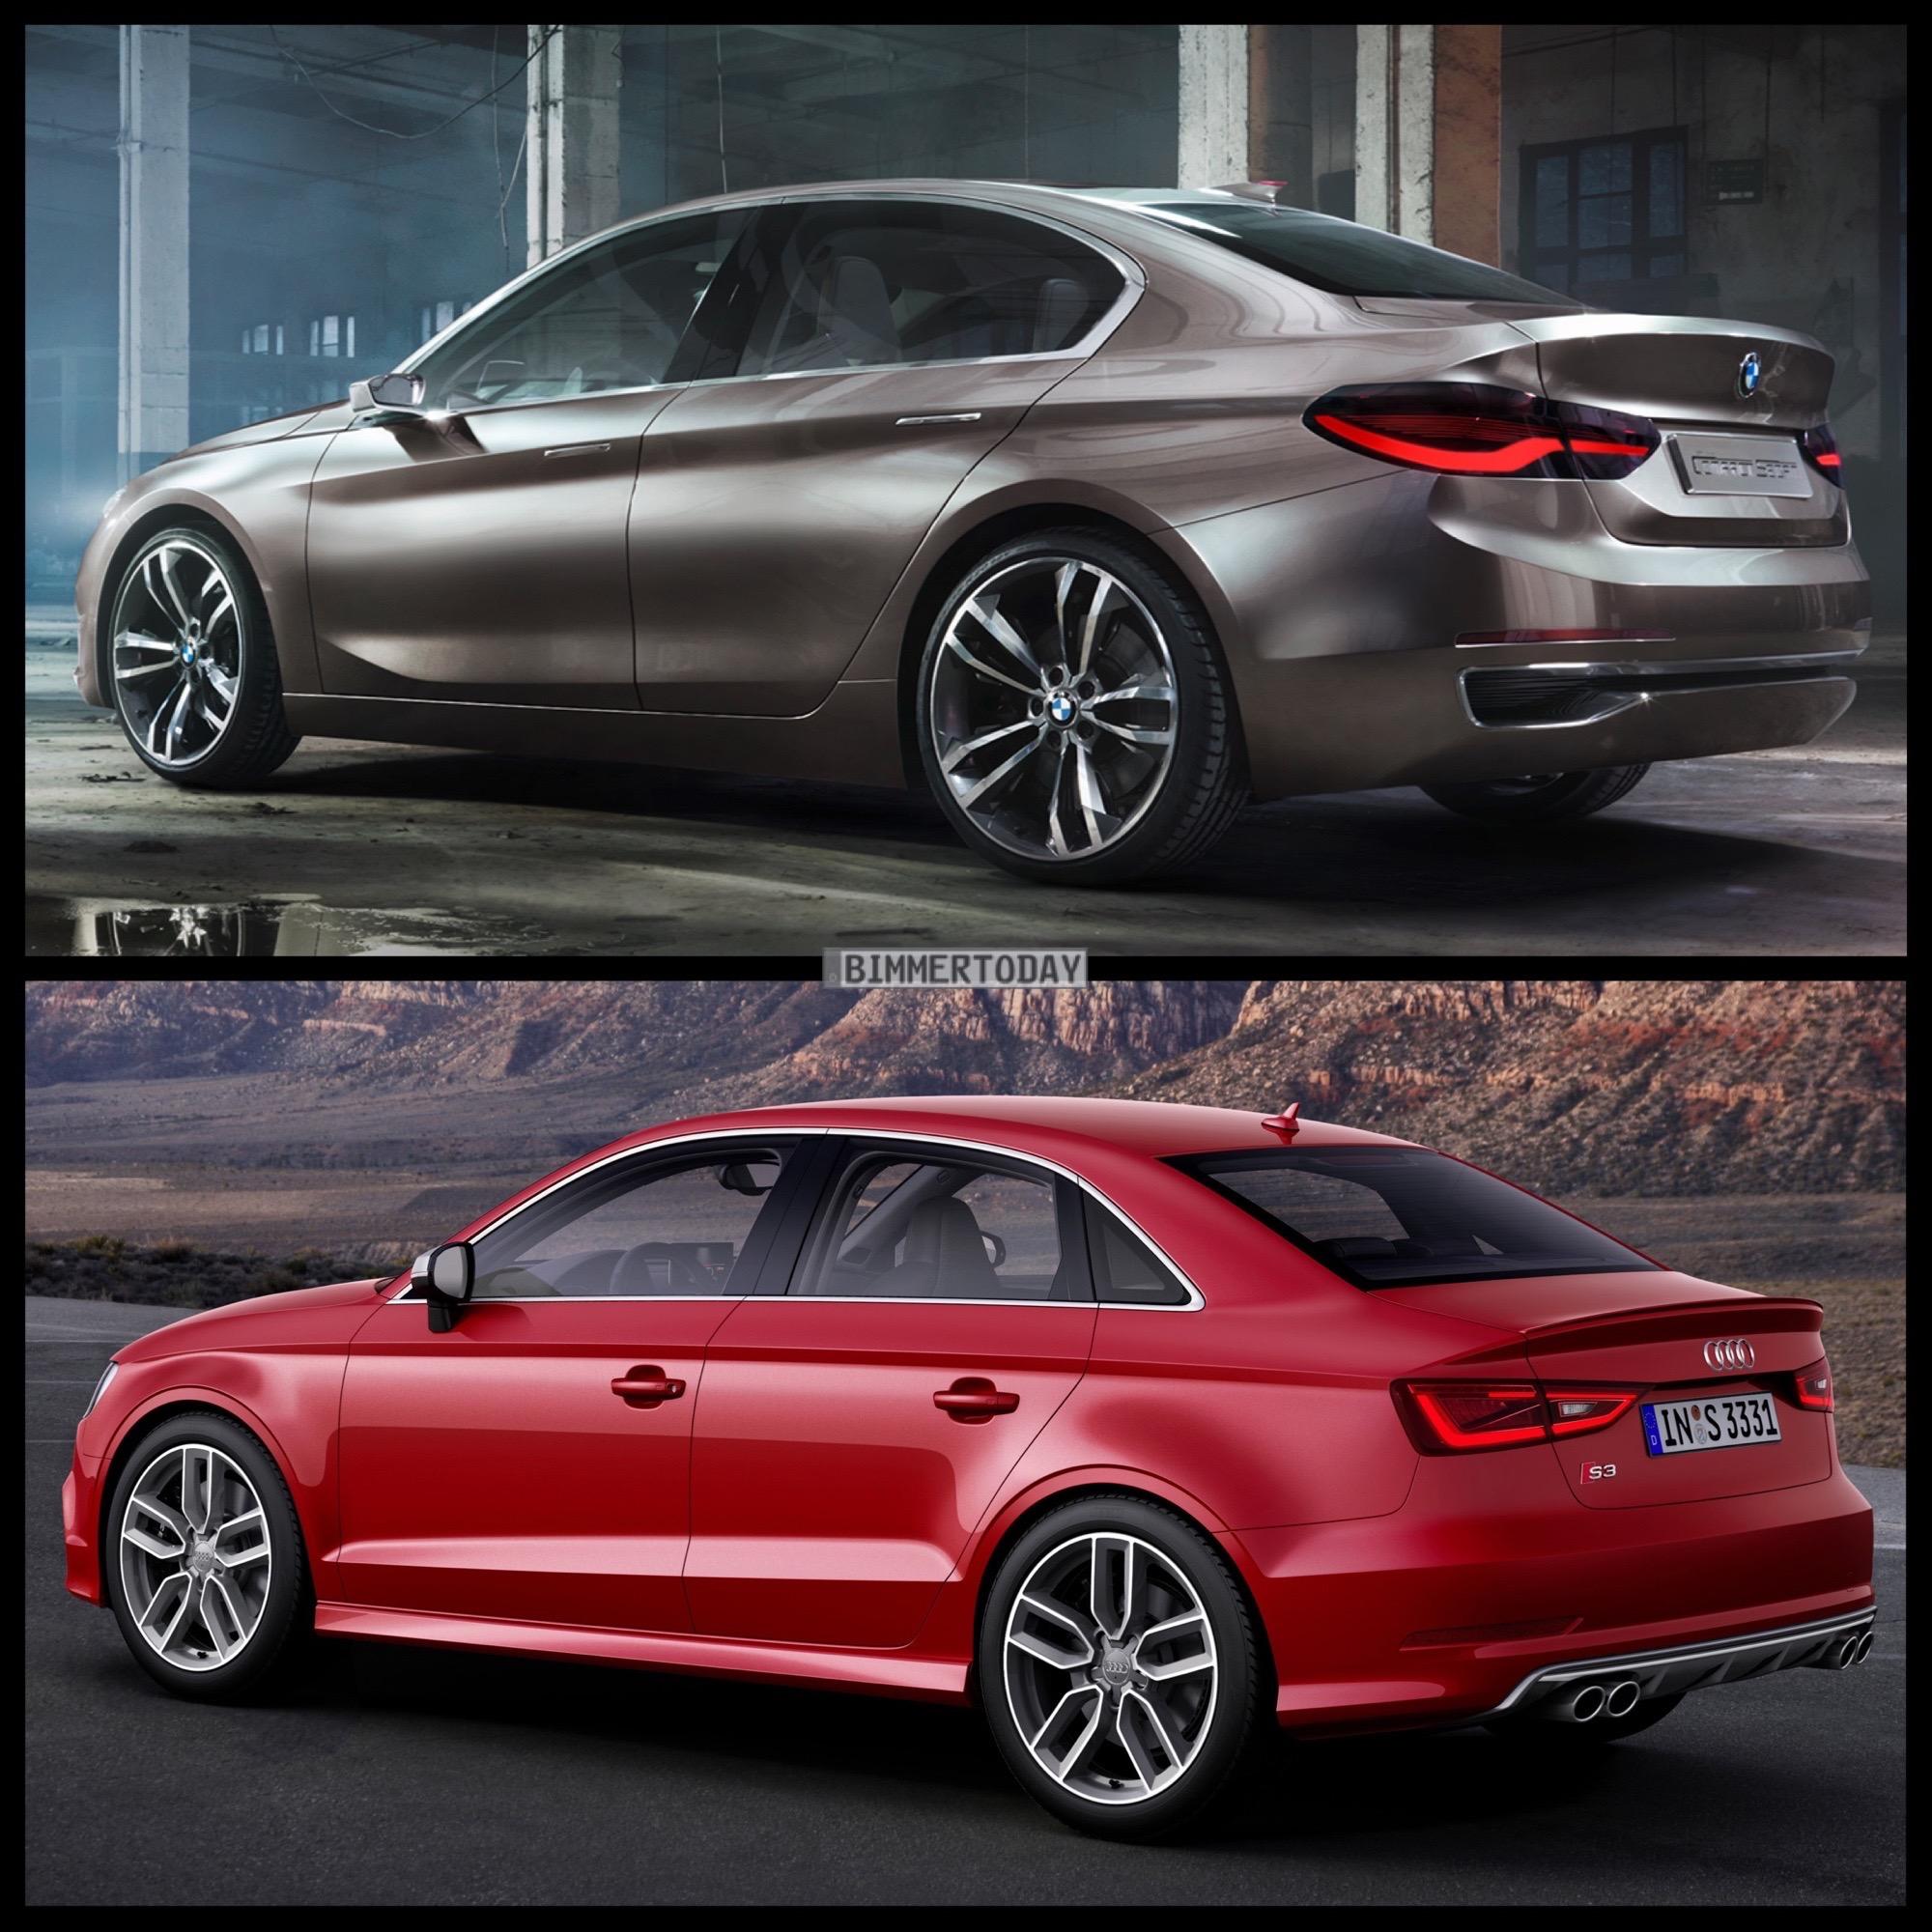 Image Comparison: BMW 1 Series Sedan Vs Audi A3